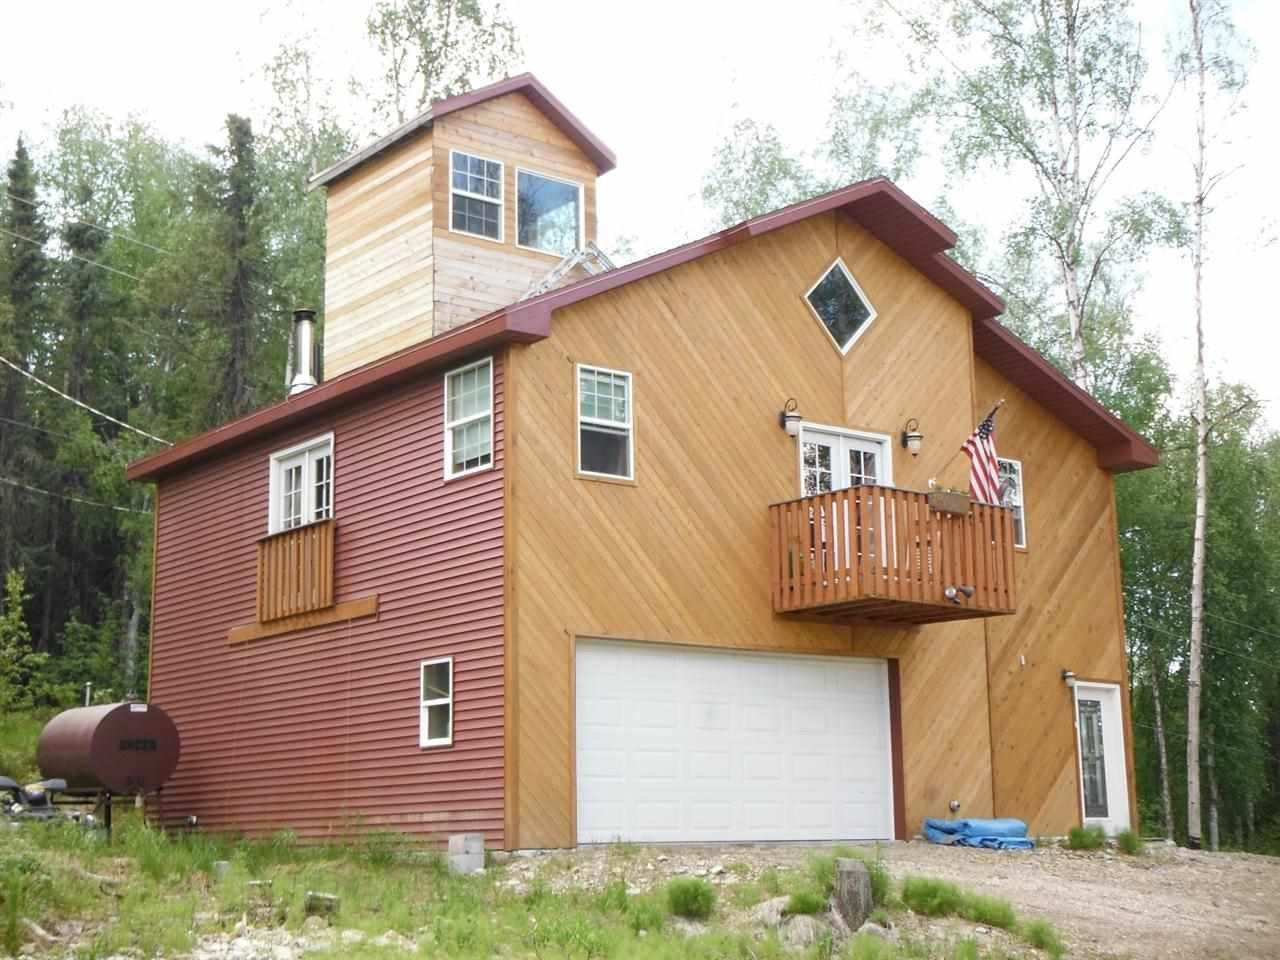 803 Pinehurst Ct, Fairbanks, AK 99712